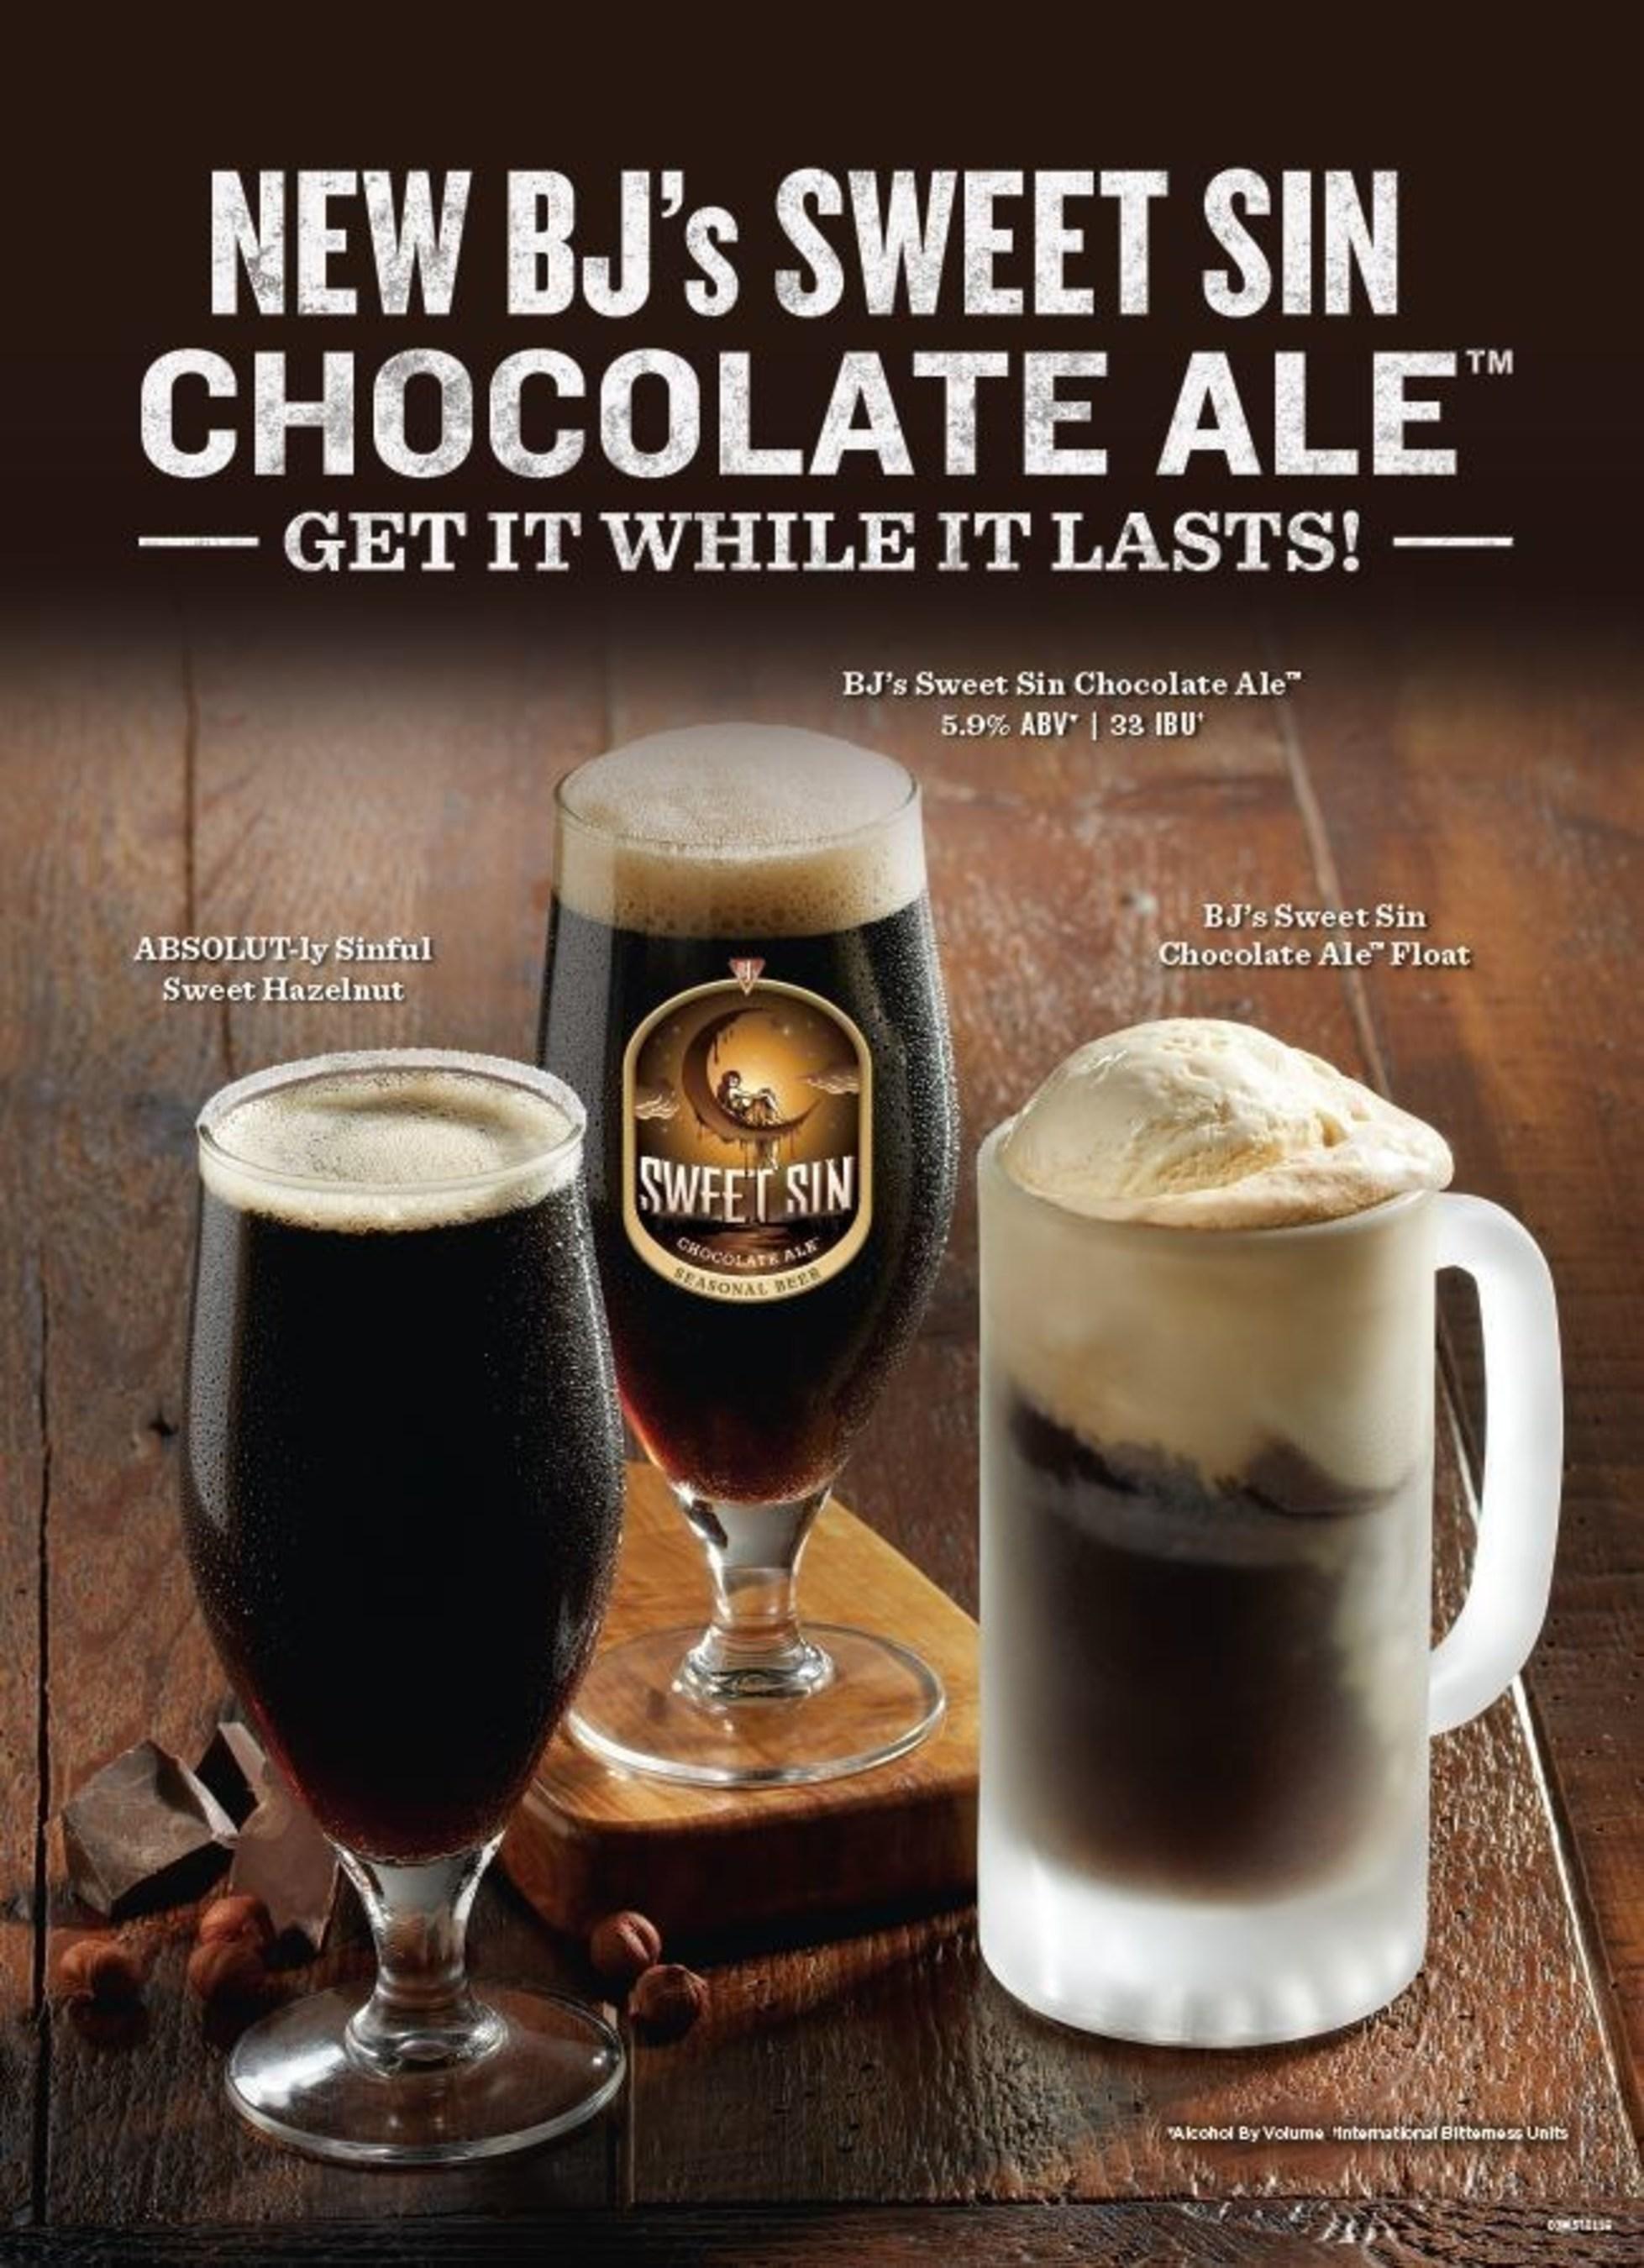 New BJ's Sweet Sin Chocolate Ale(TM)